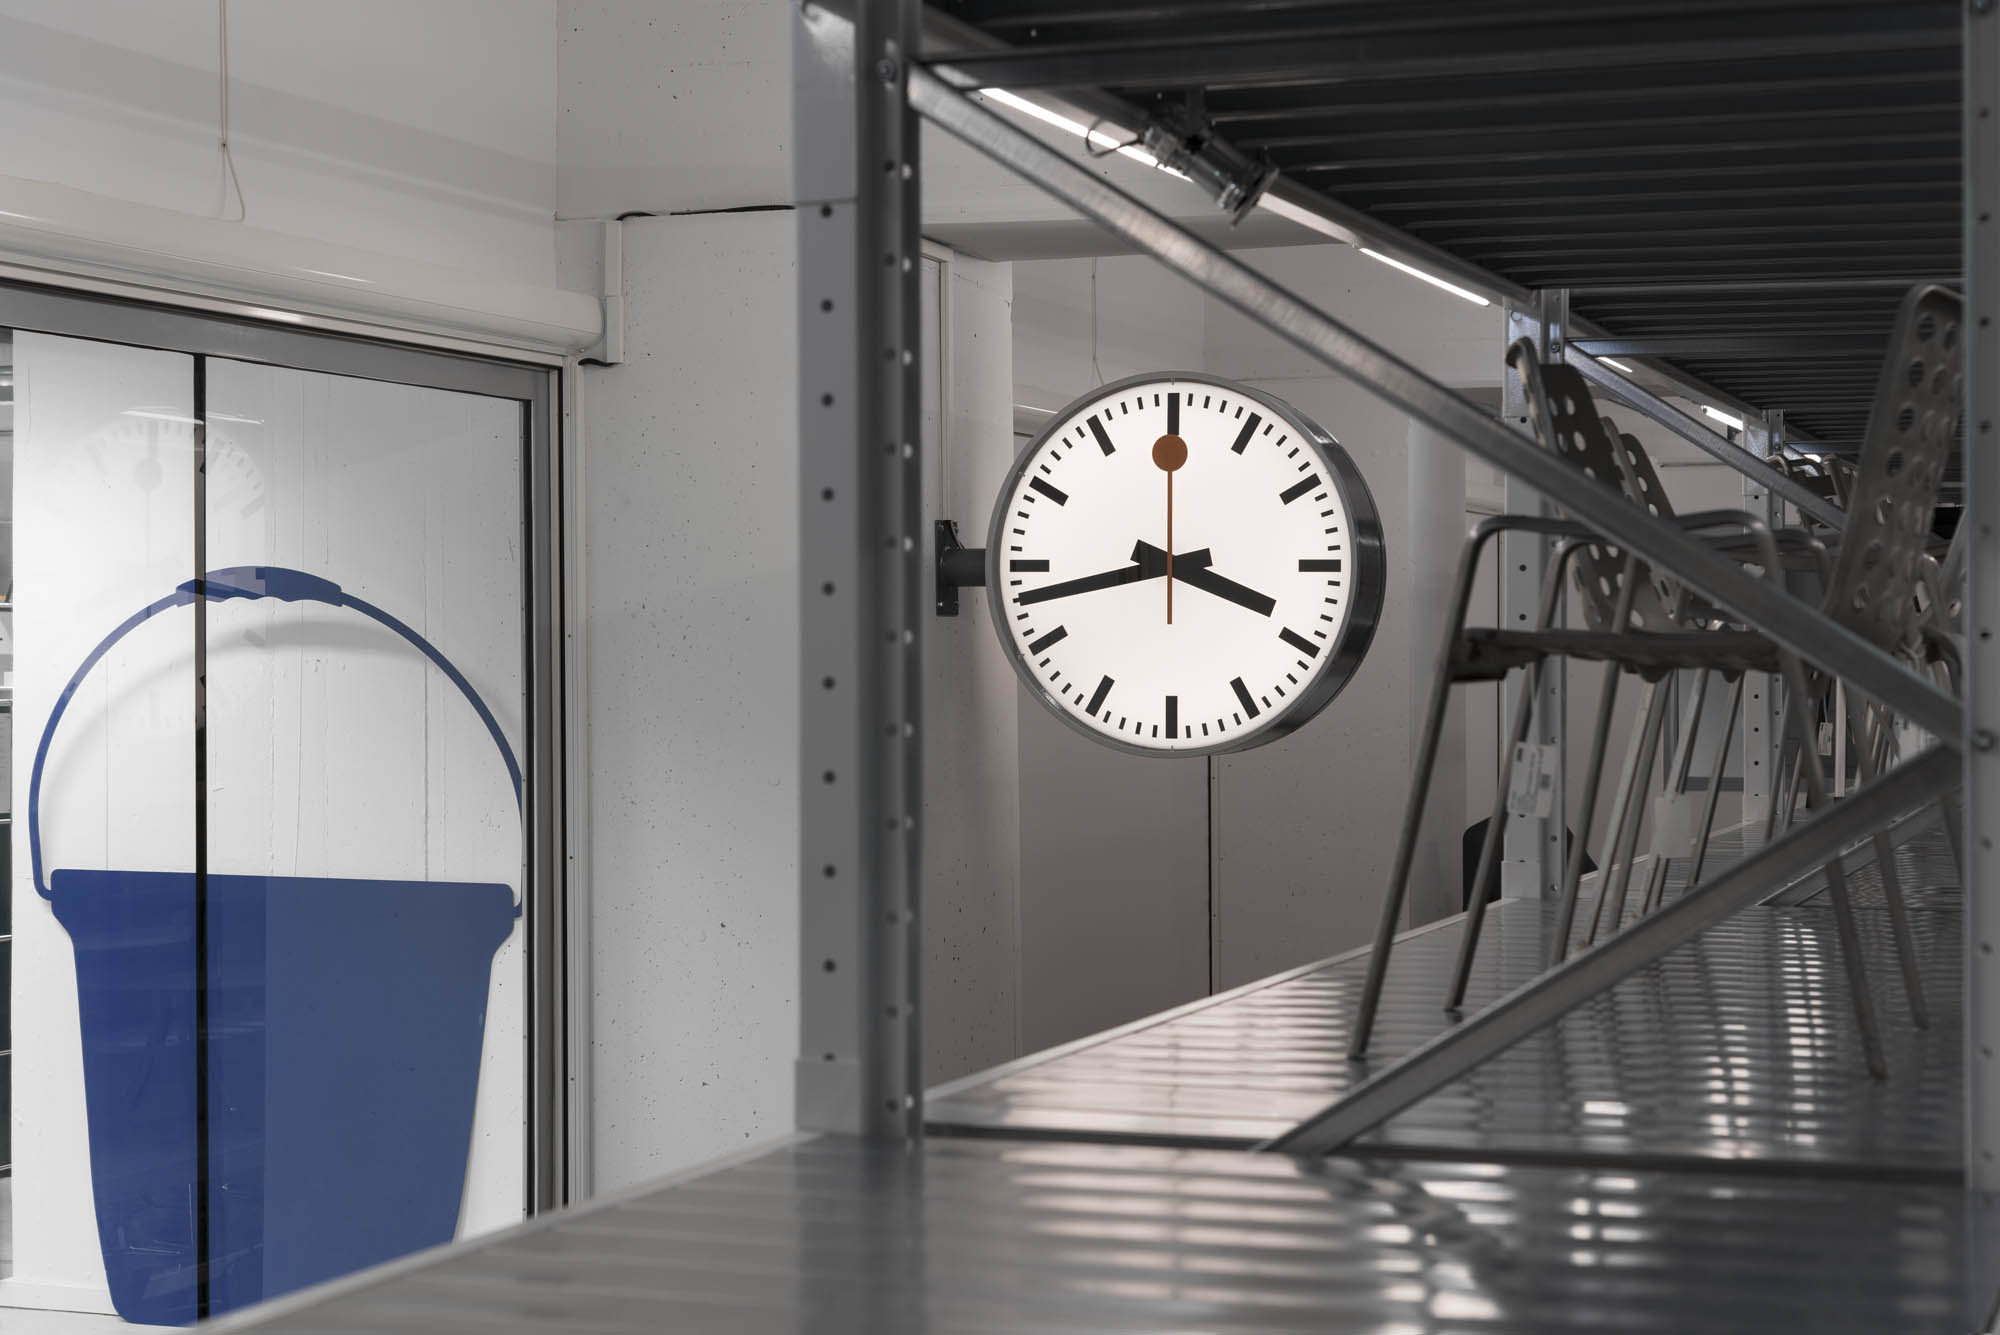 SBB Bahnhofsuhr Hans Hilfiker Horloge